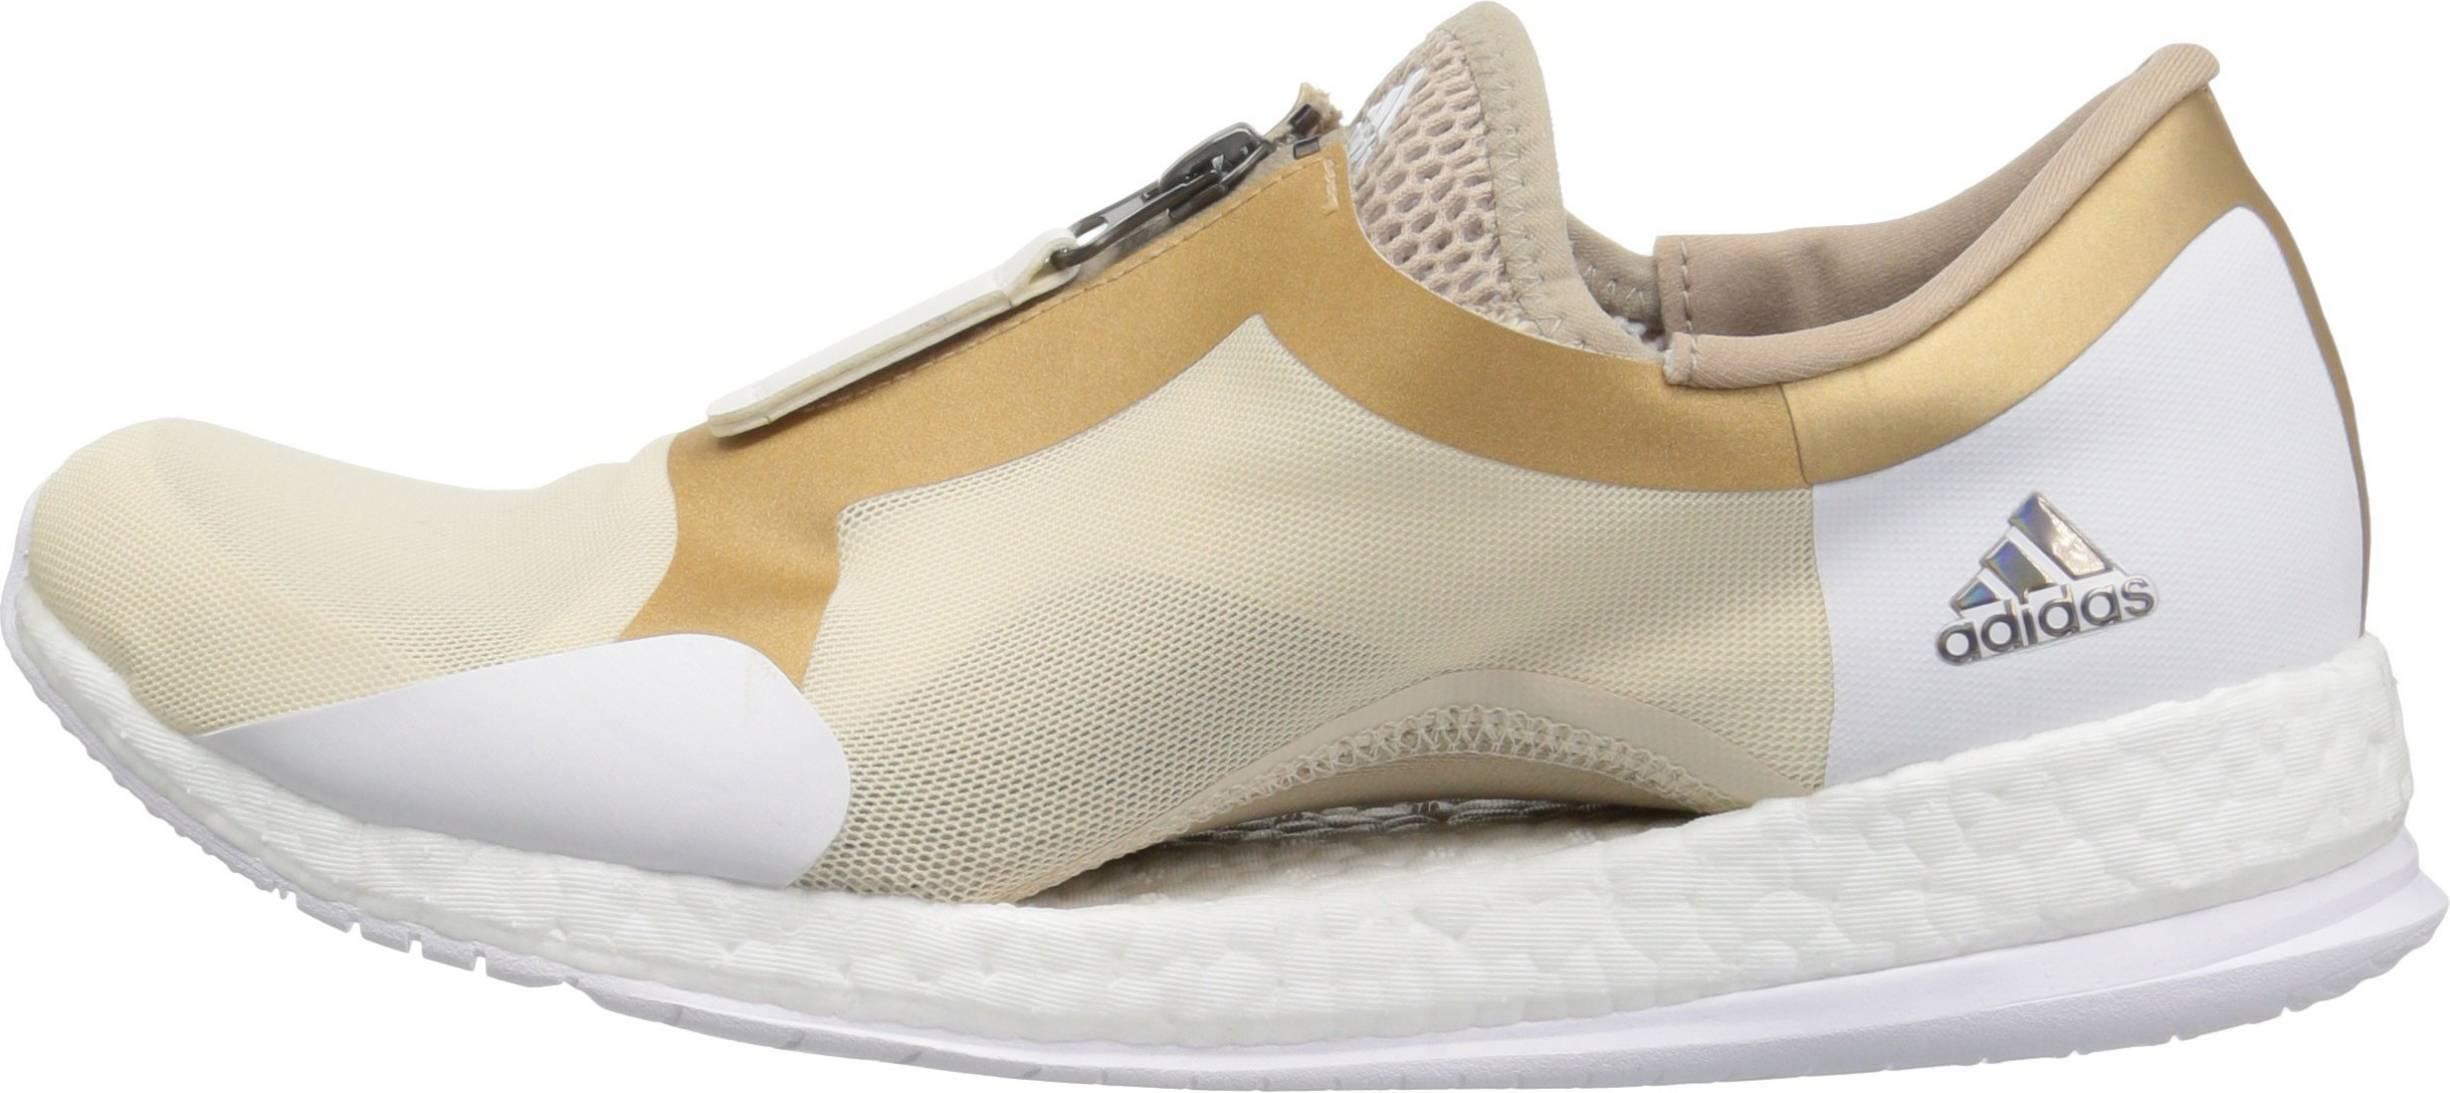 dubla Merchandising cvadrant adidas pure boost x tr 2